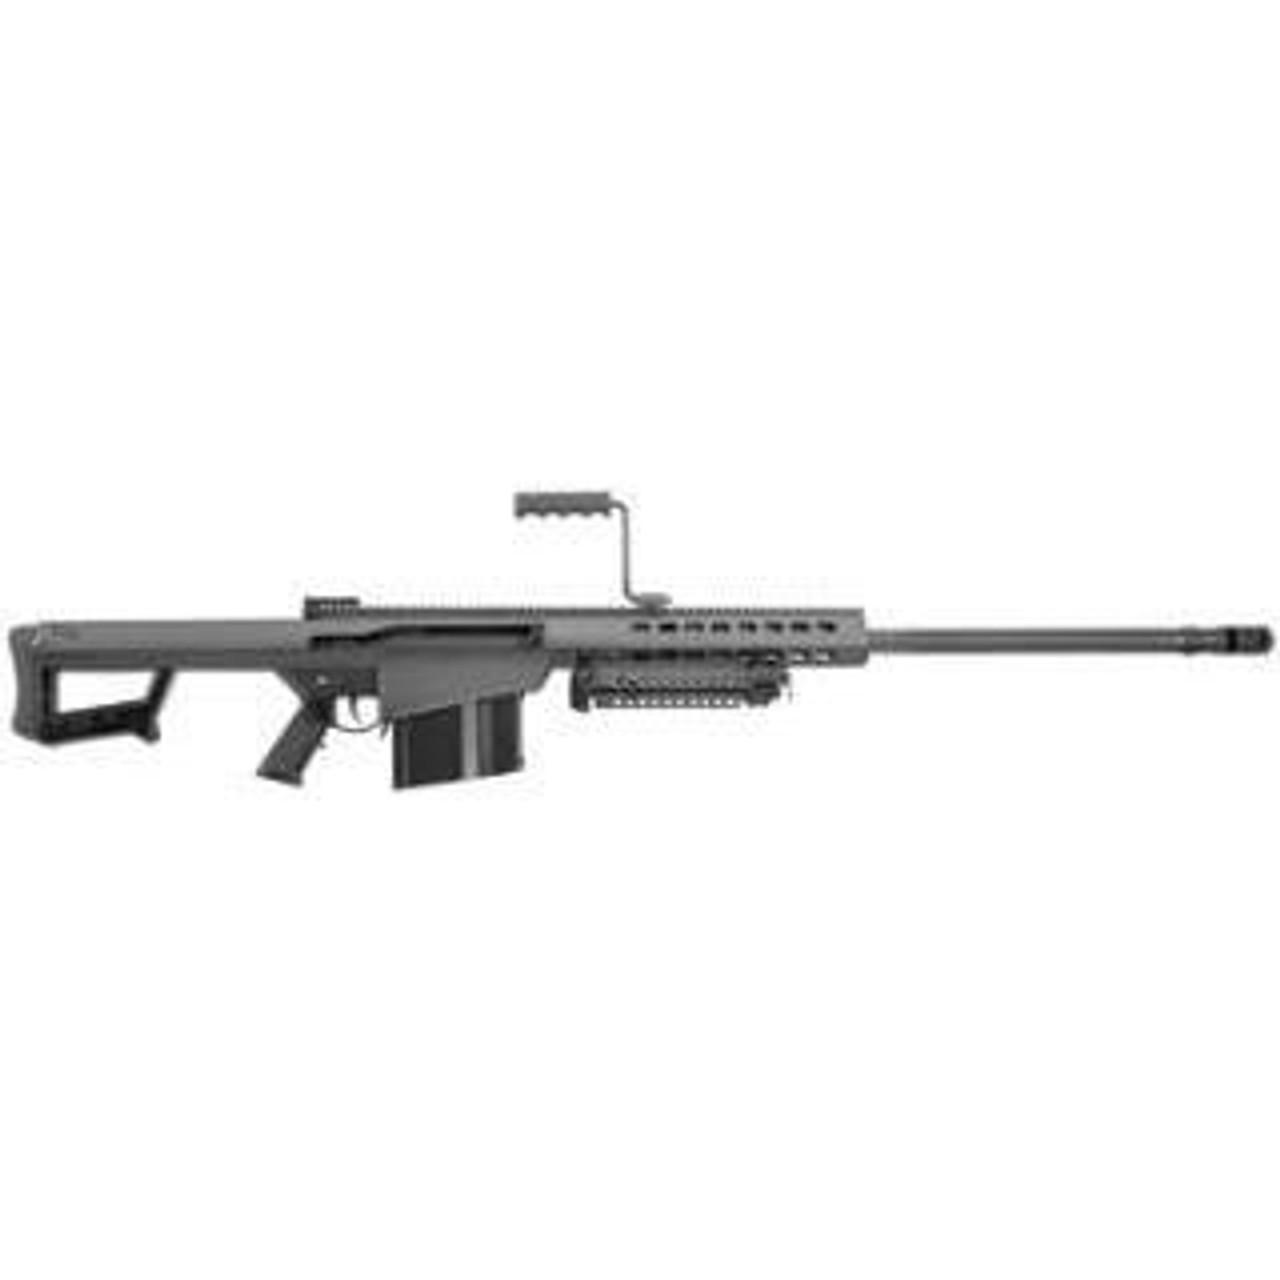 Barrett M82A1 CALIFORNIA LEGAL - .416